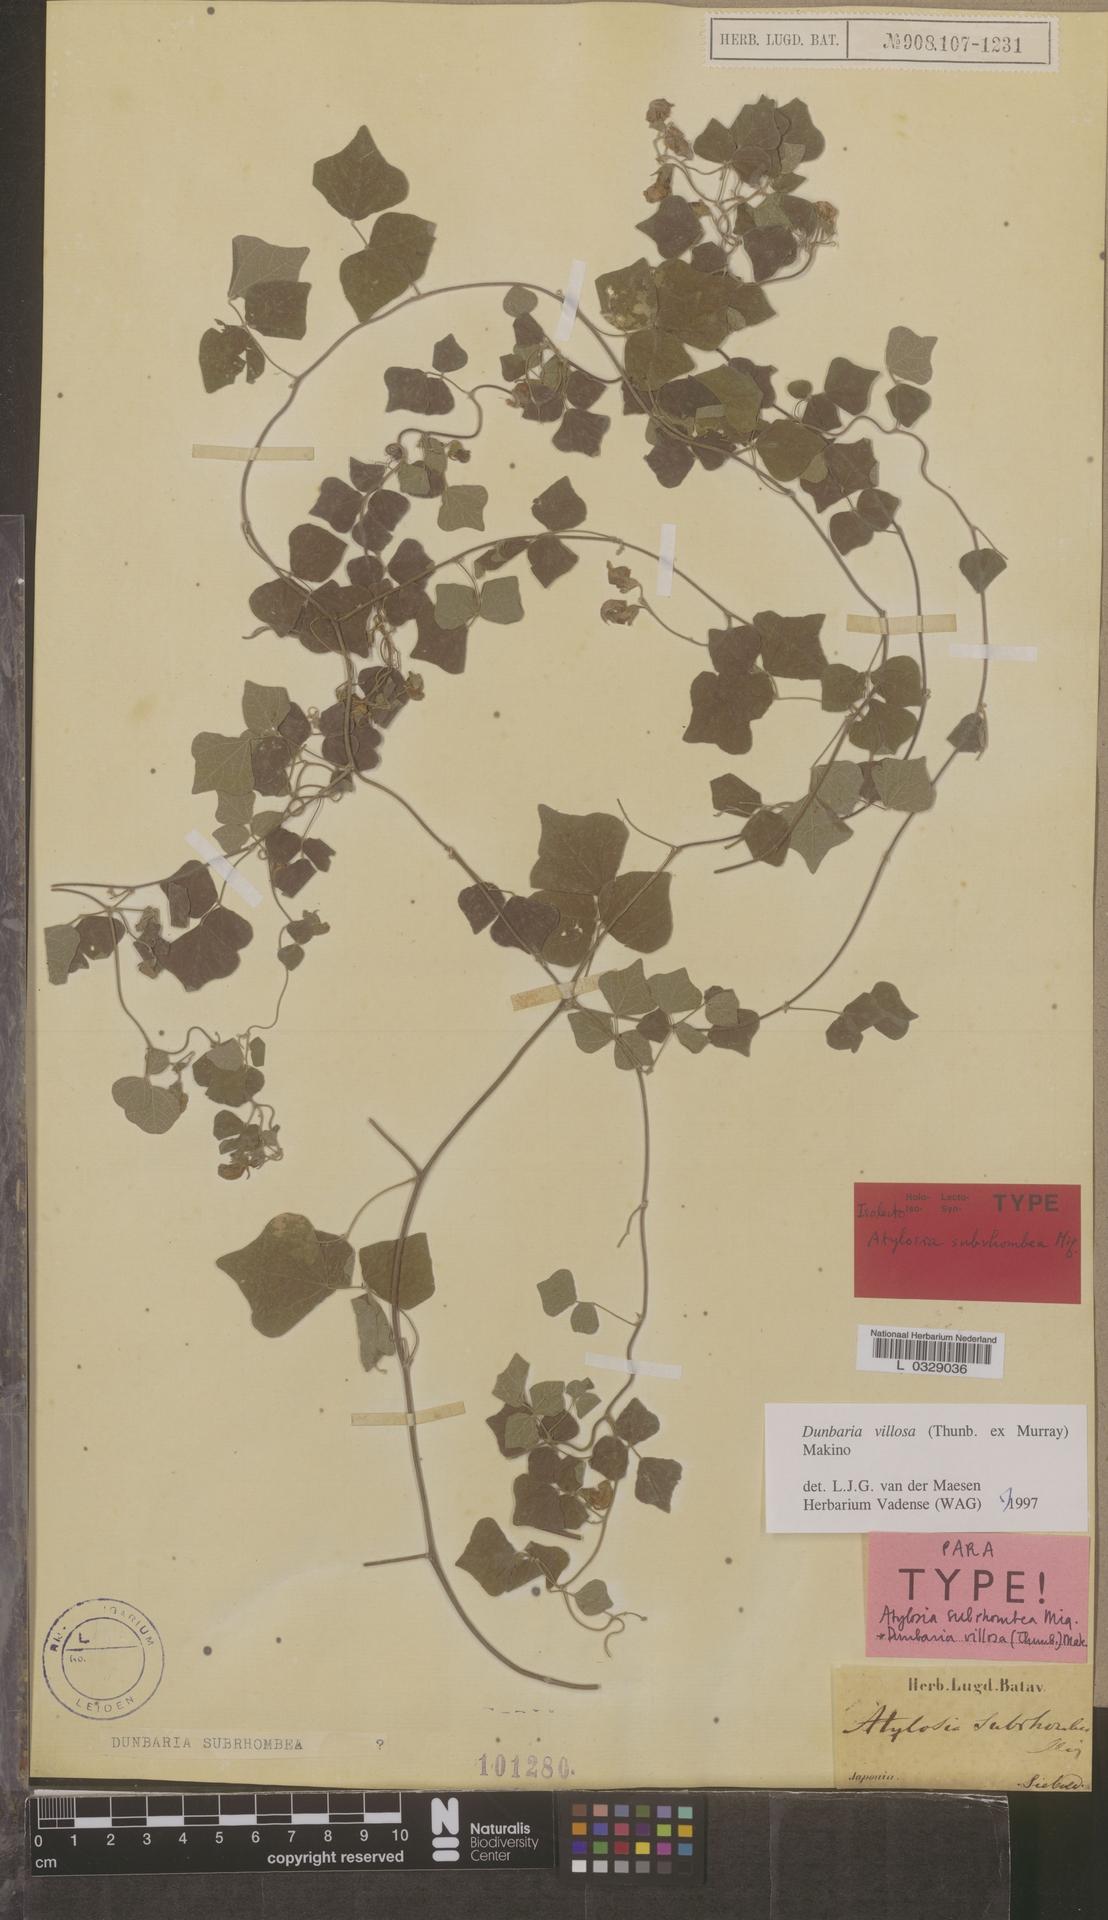 L  0329036 | Dunbaria villosa (Thunb. ex Murray) Makino